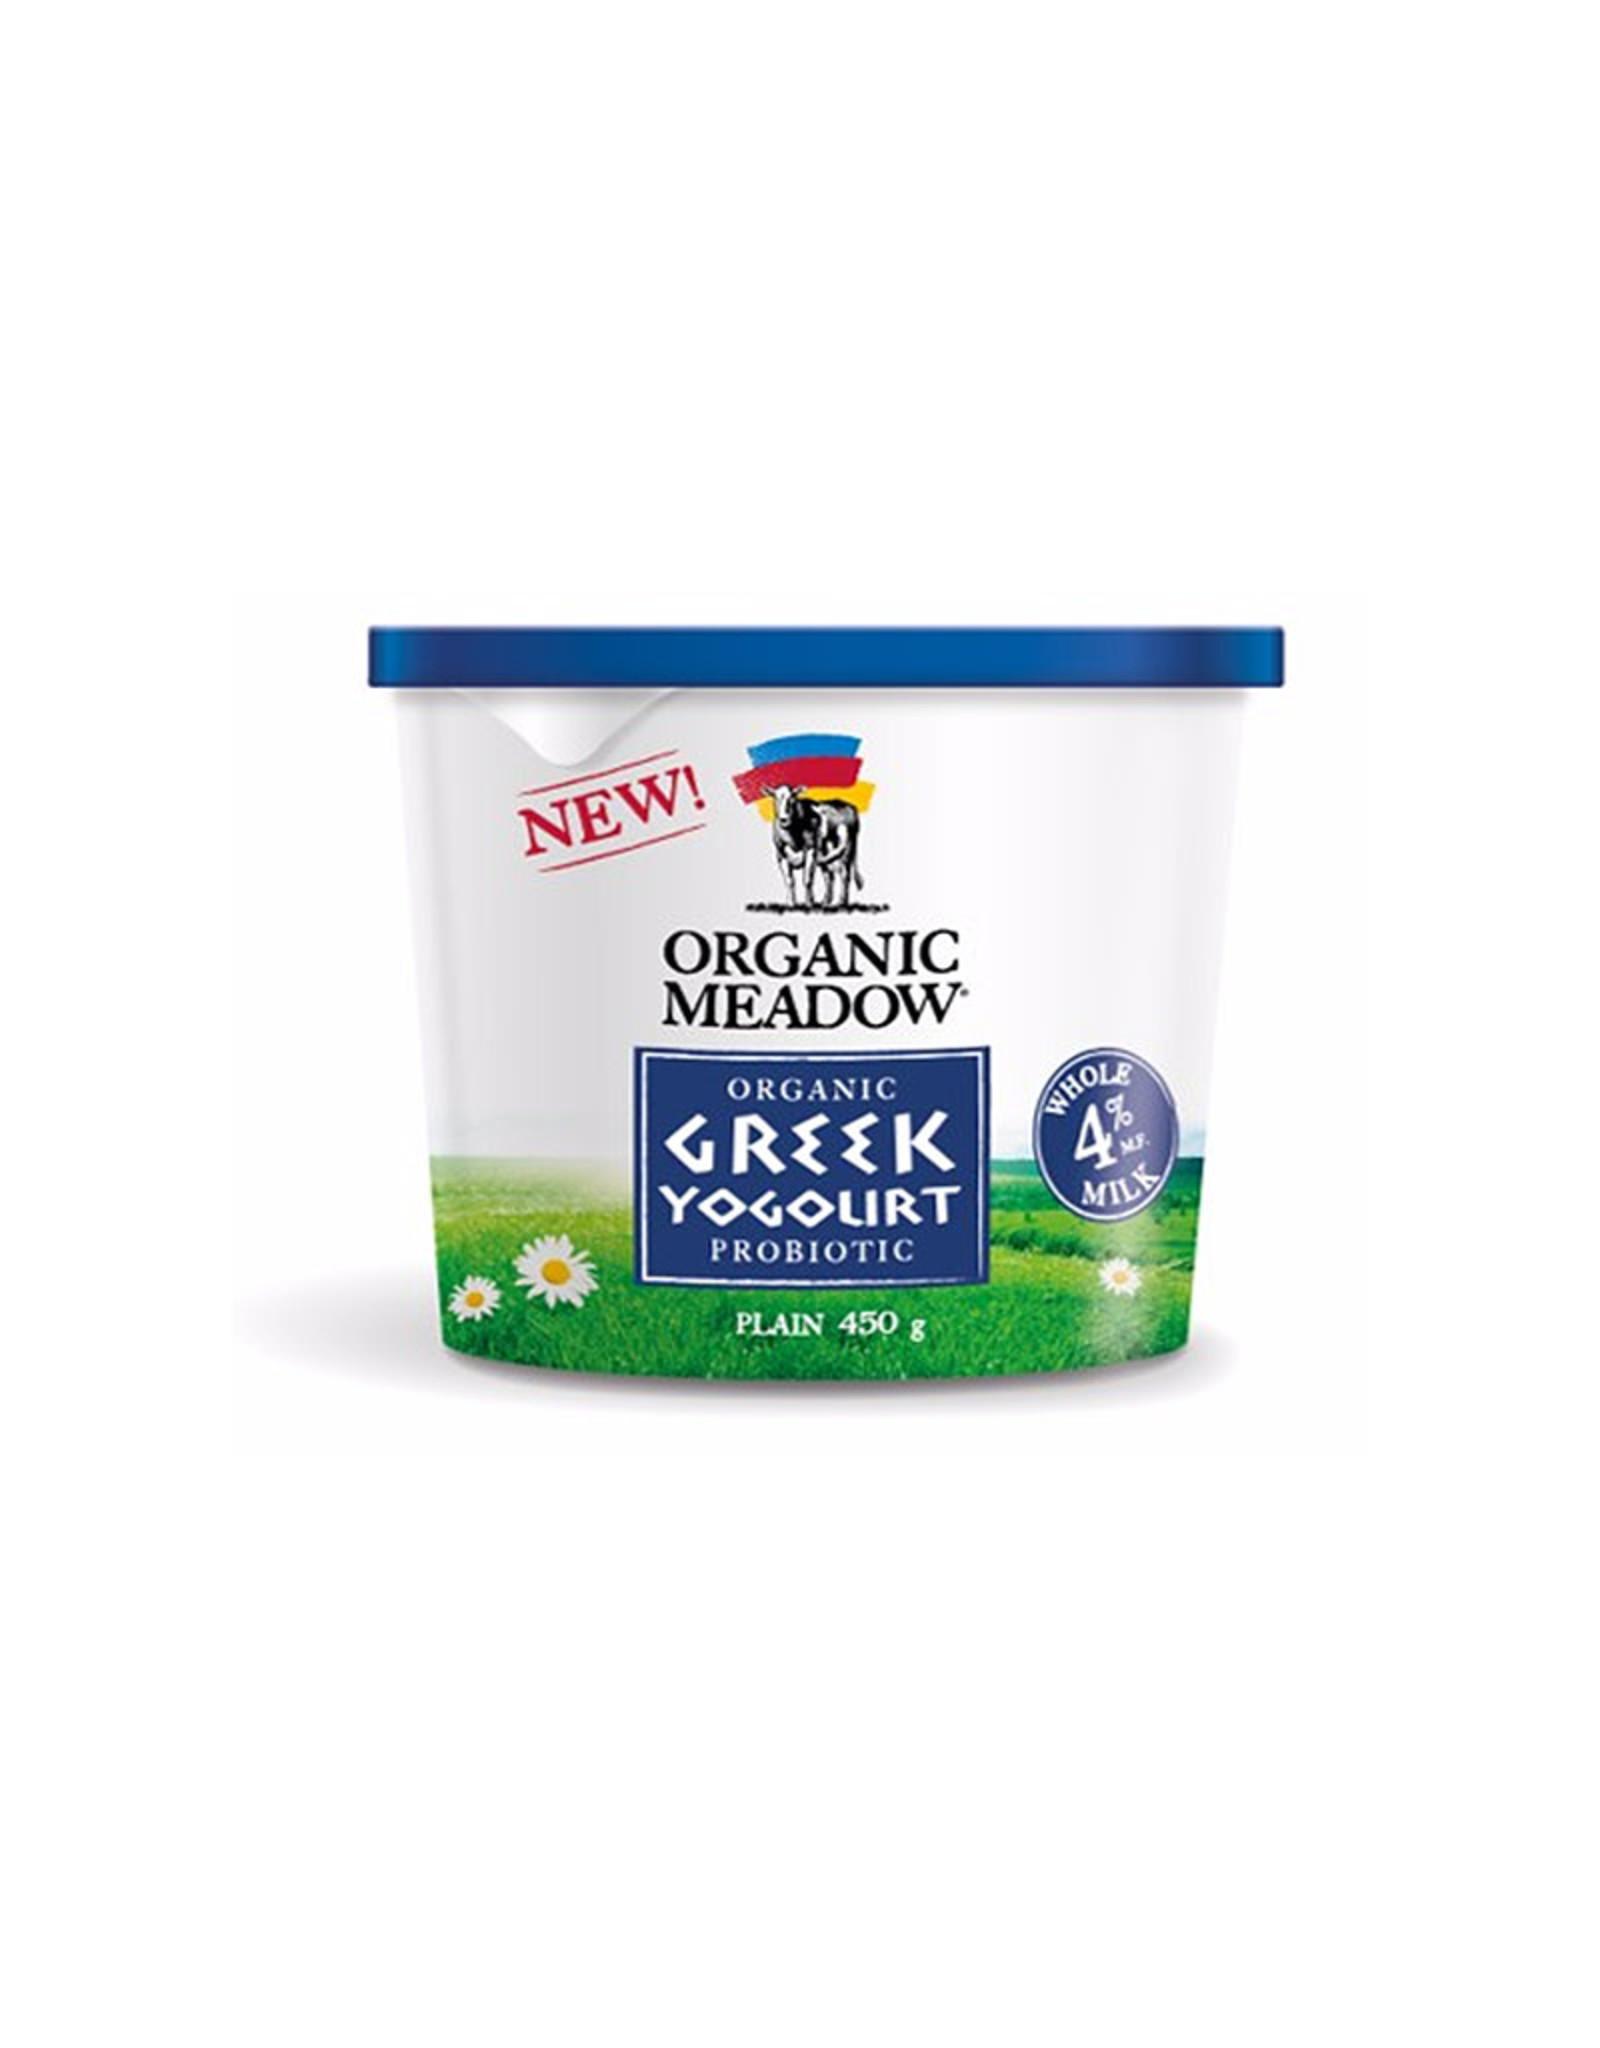 Organic Meadow Organic Meadow - 4% M.F. Grass Fed Greek Yogurt (450g)